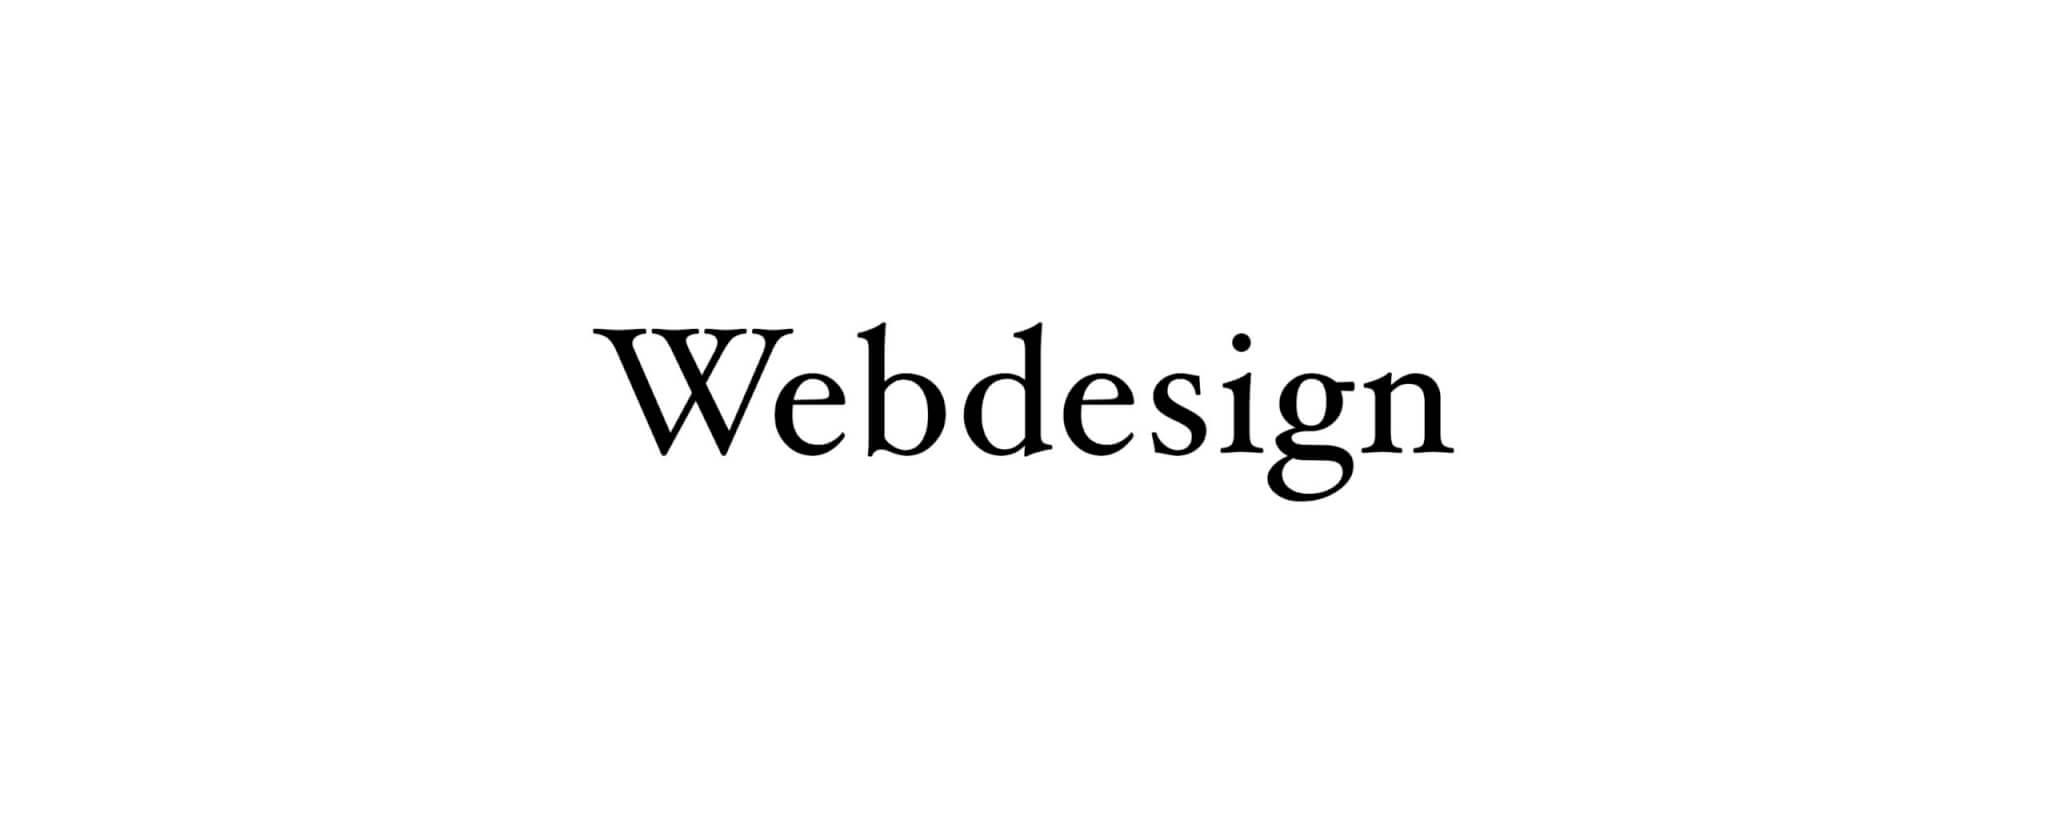 Belvedere_Vodka_Branding_FORMM_webdesign